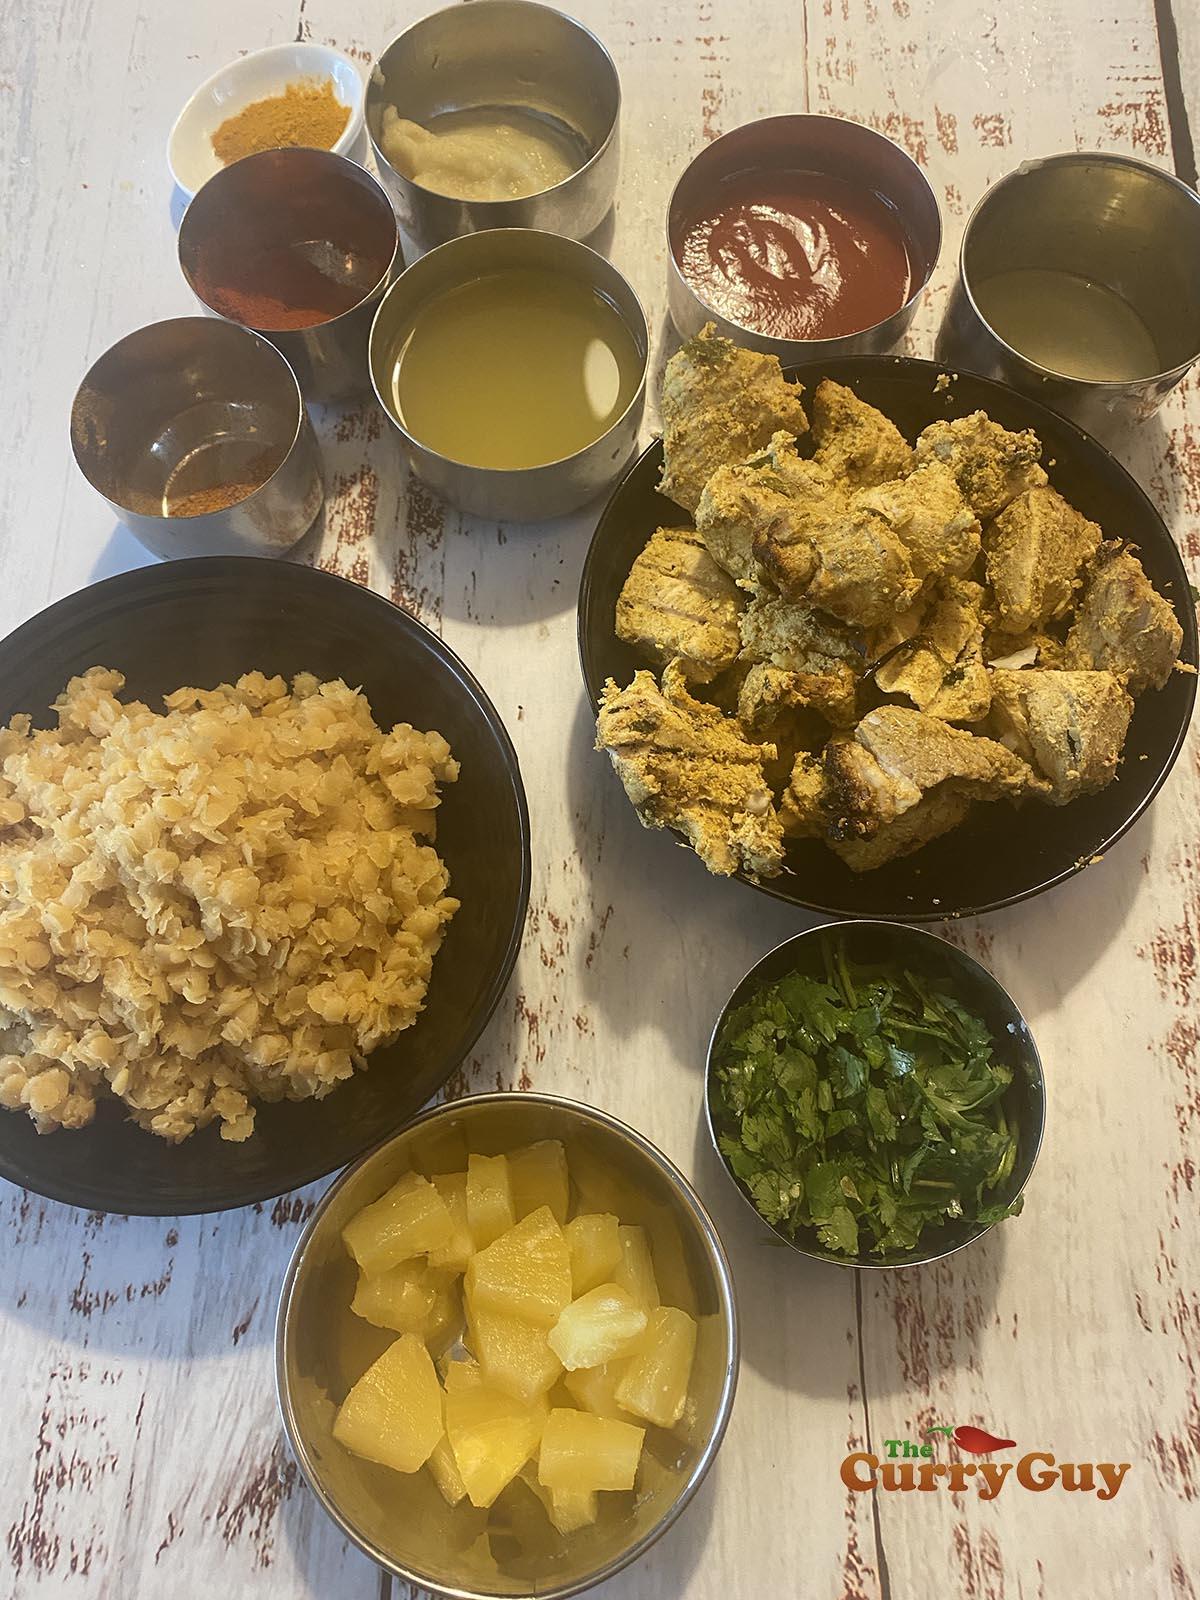 Preparing ingredients for chicken dhansak